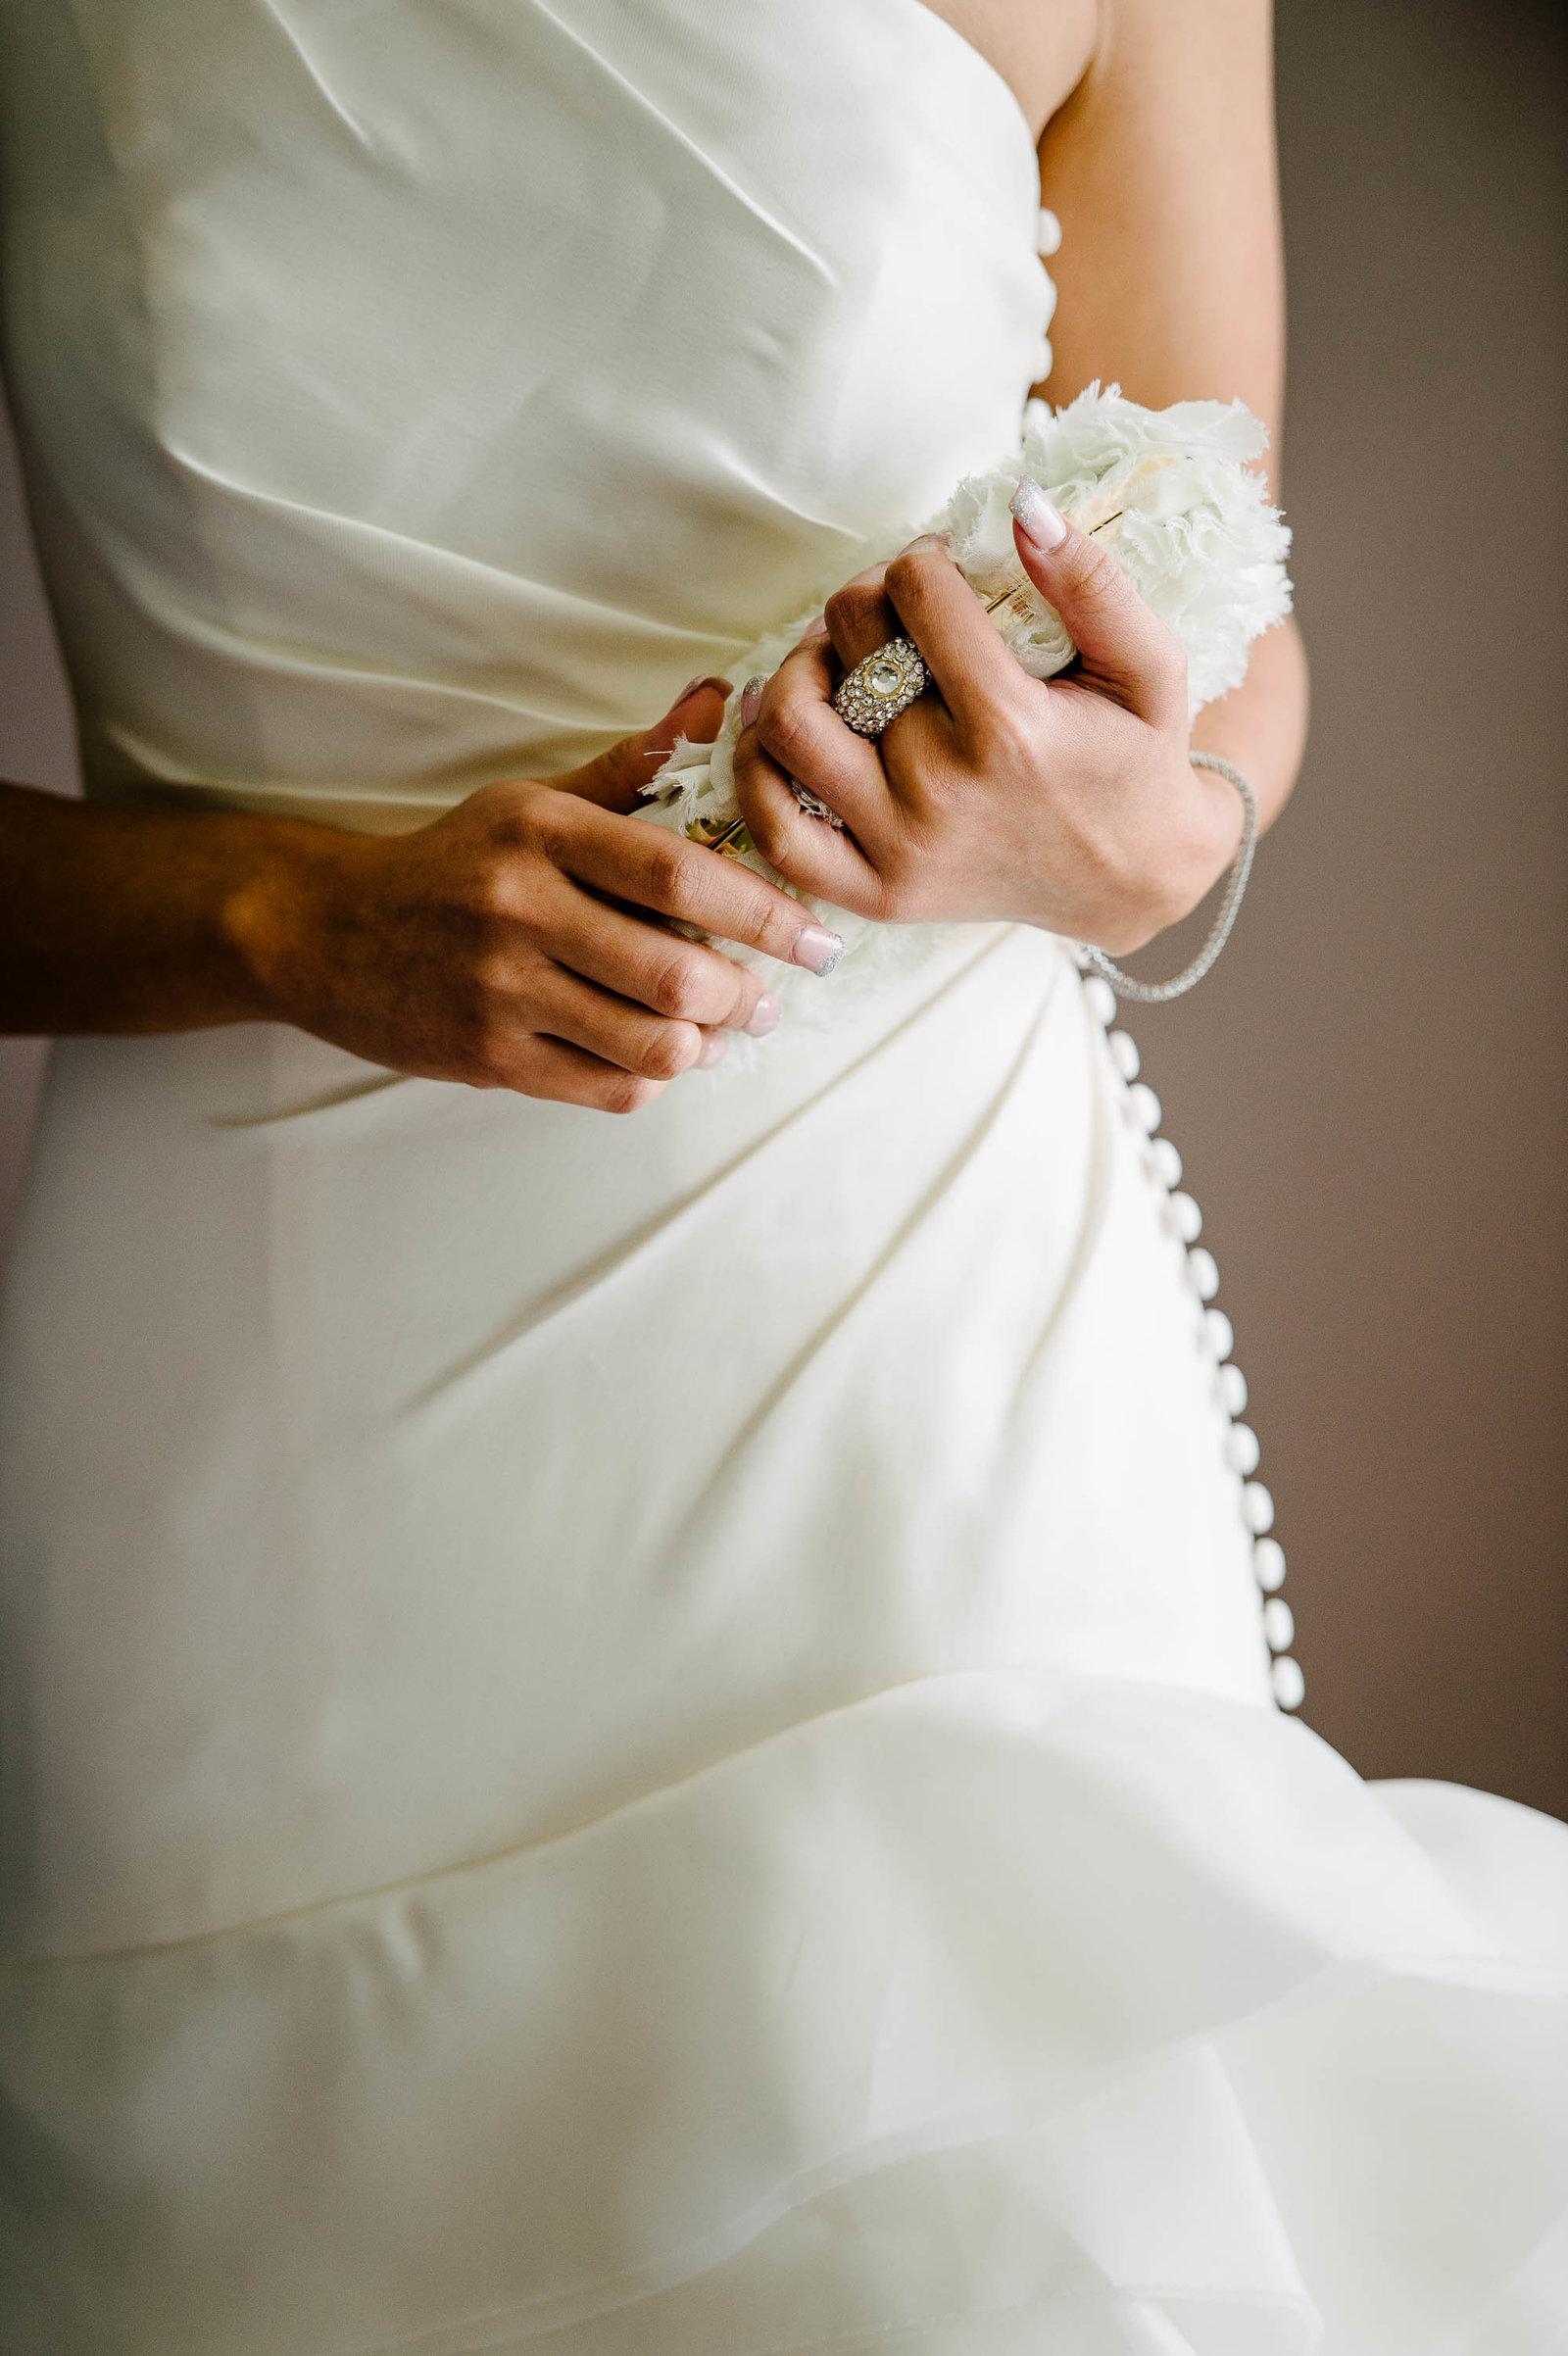 130-El-paso-wedding-photographer-VaRy_0124